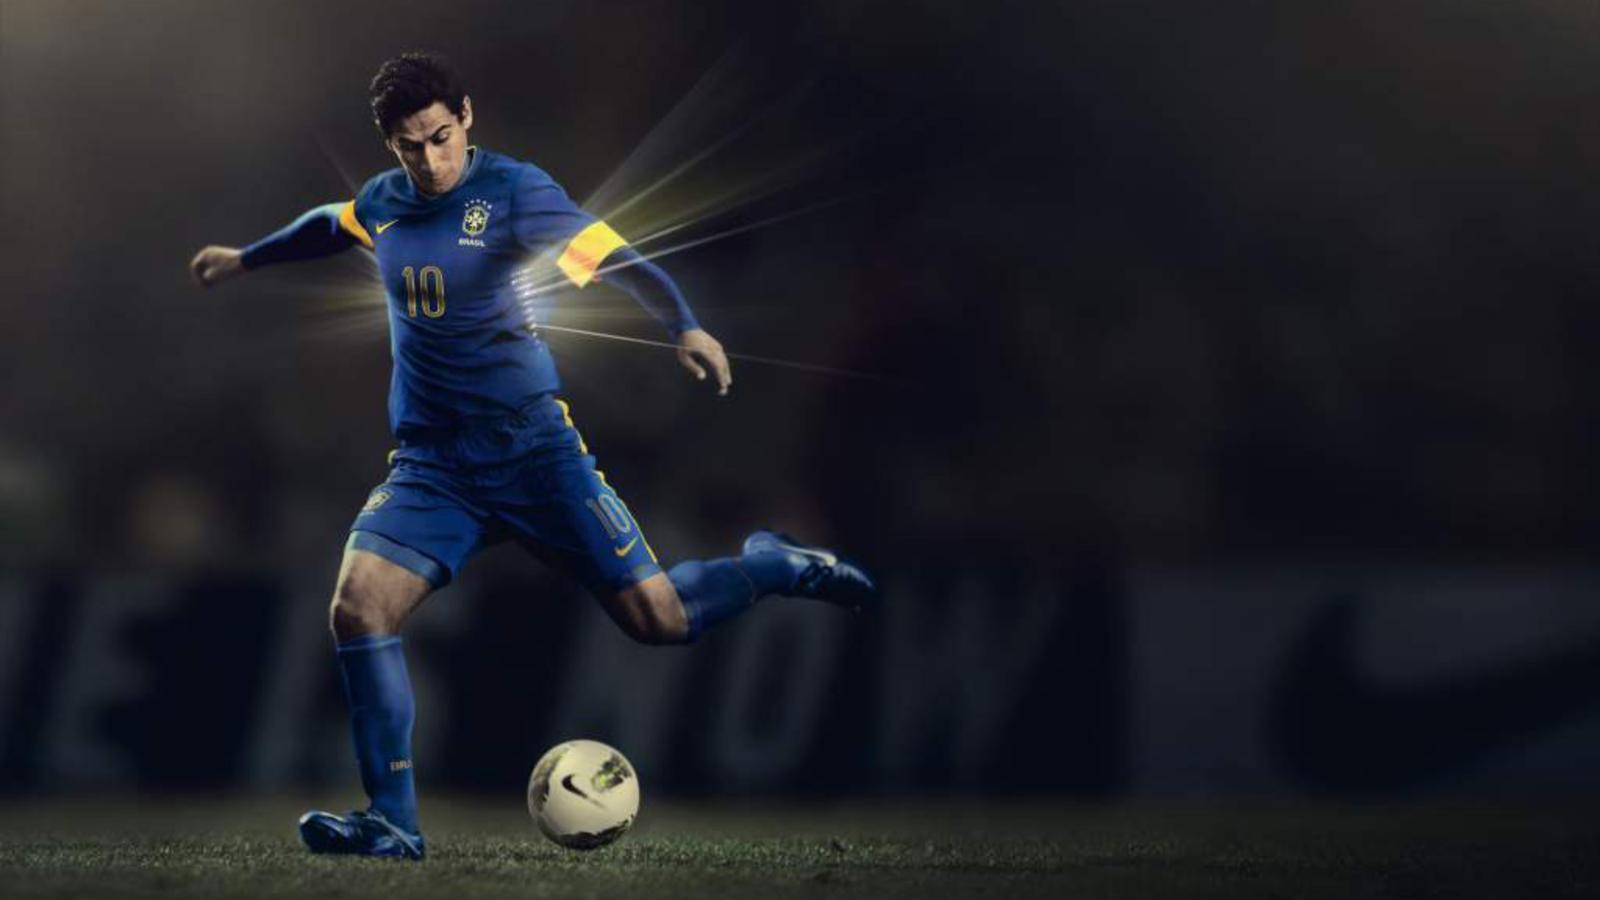 Brasil_2012_Away_Team_Kit_2